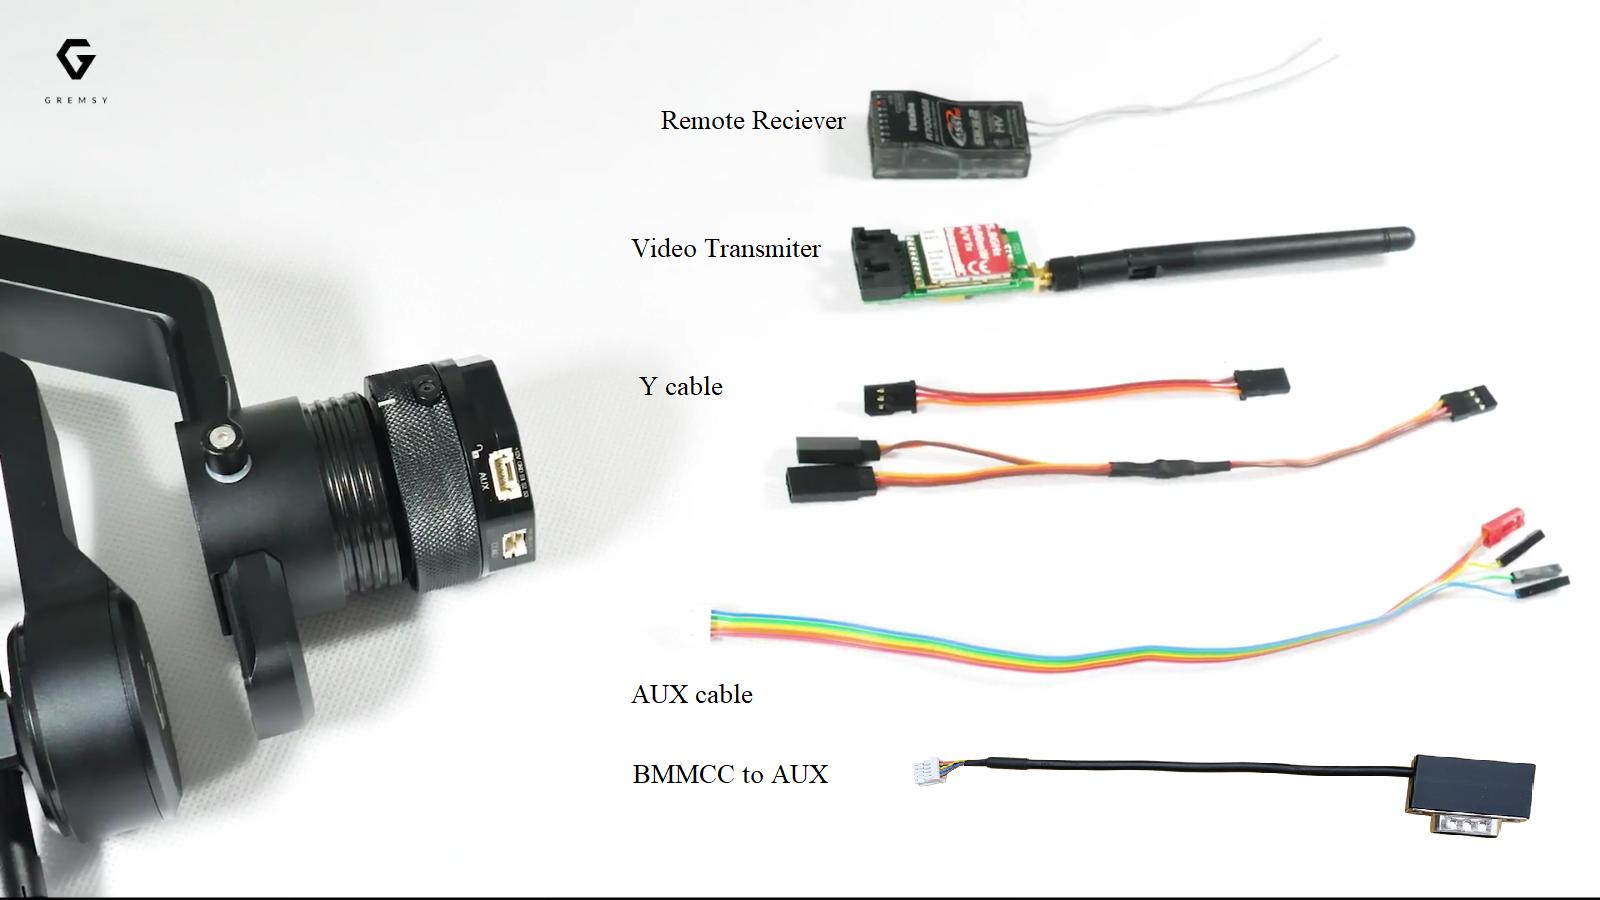 How To Setup With Blackmagic Micro Cinema Camera Gremsy